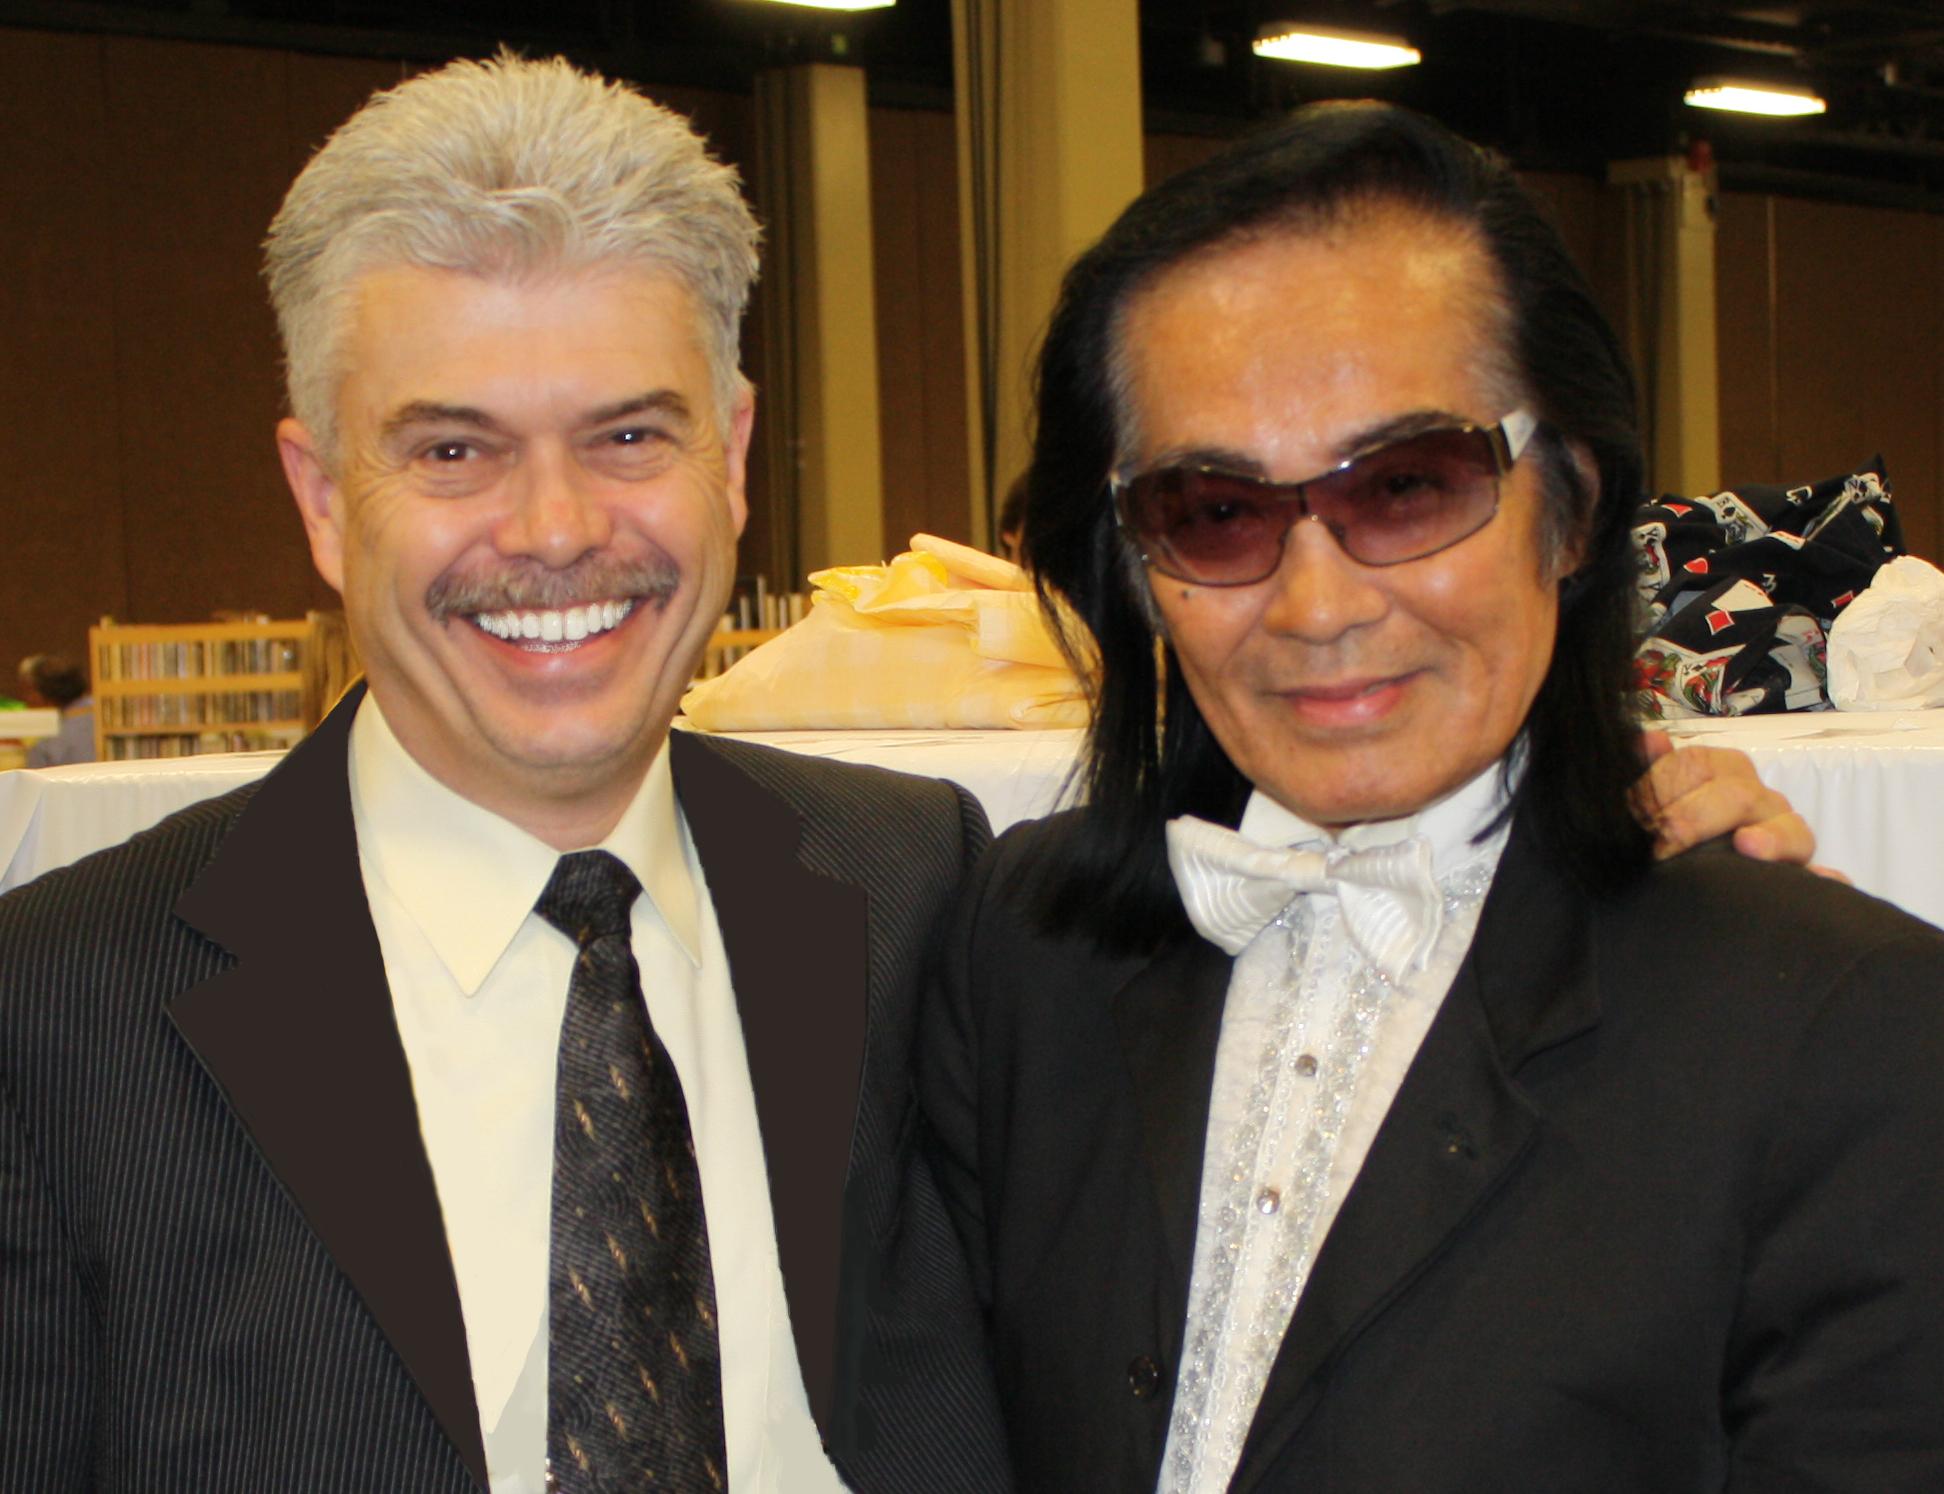 Magician BJ Hickman Featured At Magicians' Convention Honoring Shimada